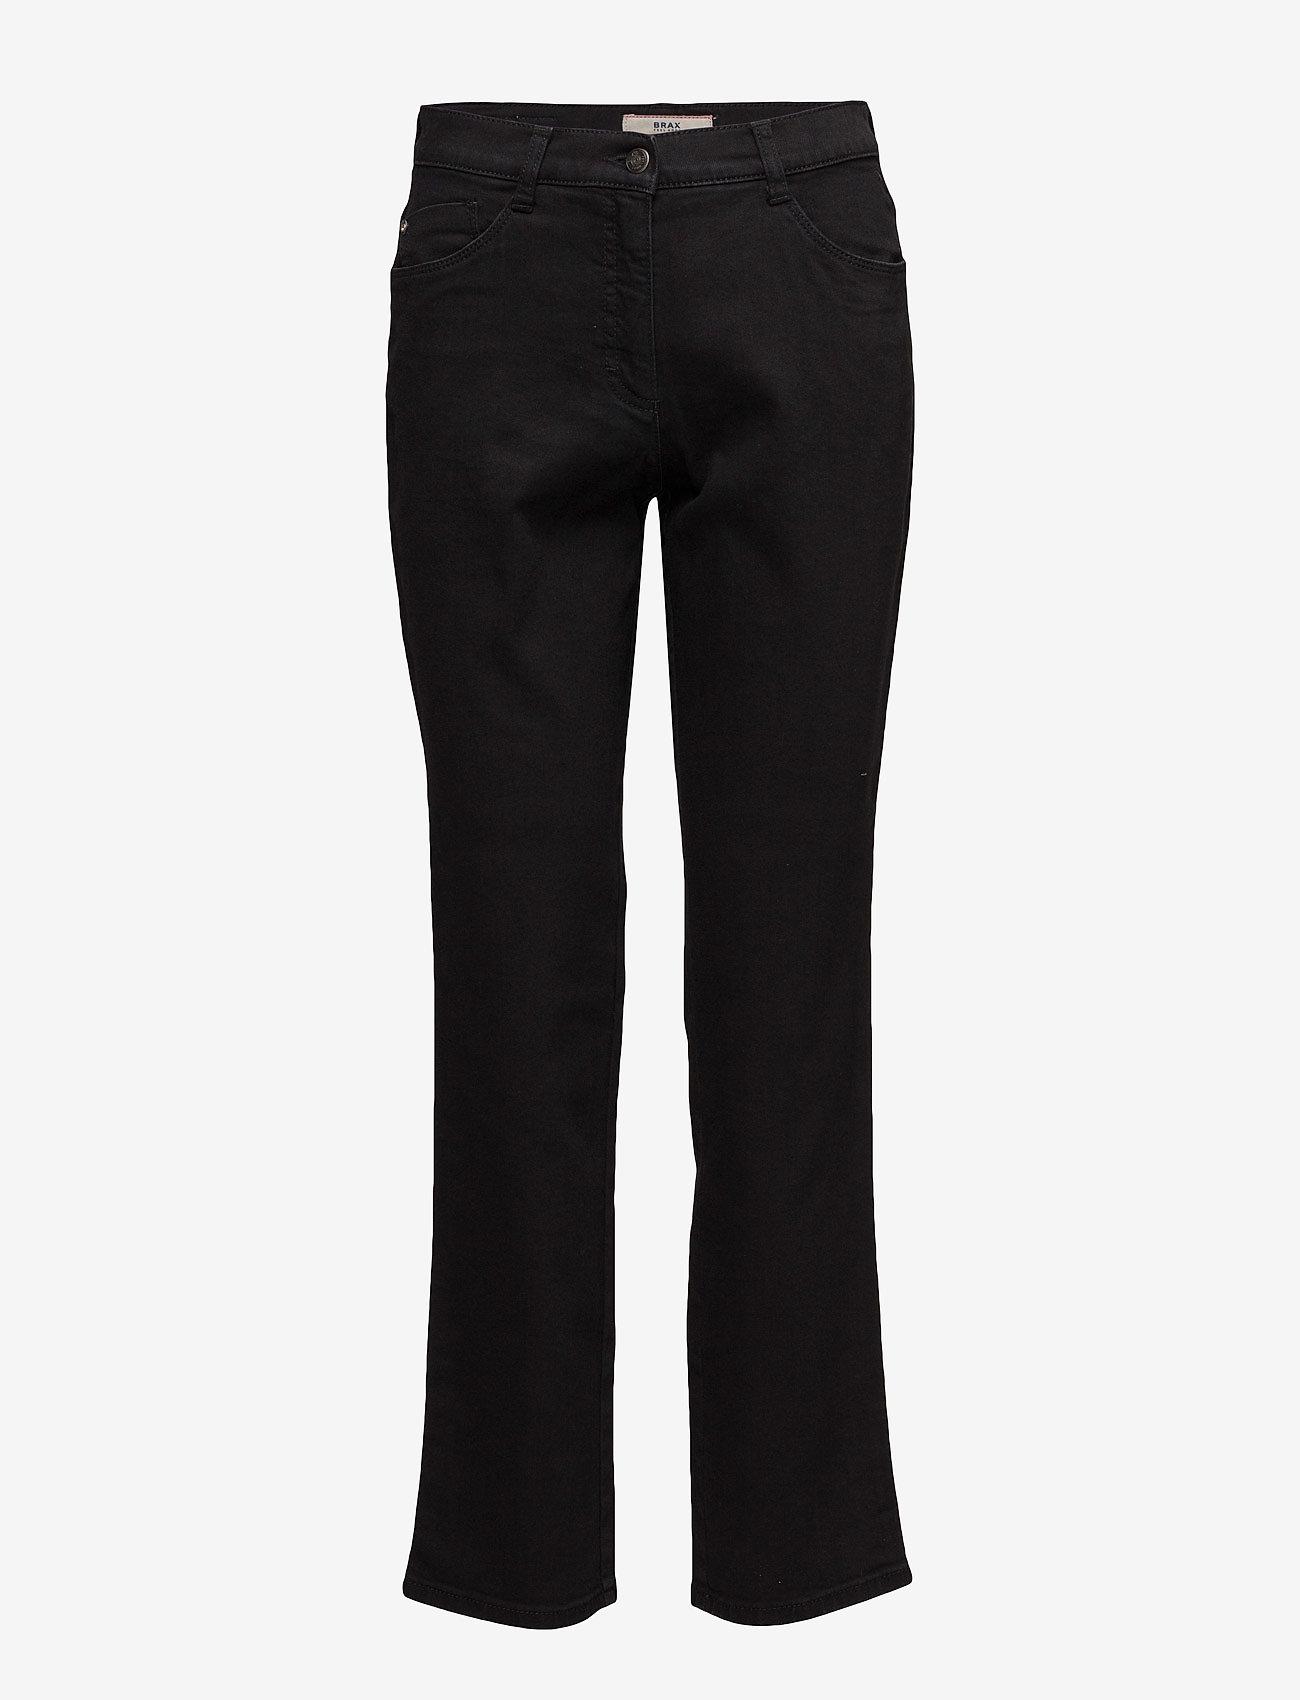 BRAX - CAROLA - straight jeans - clean black black - 0